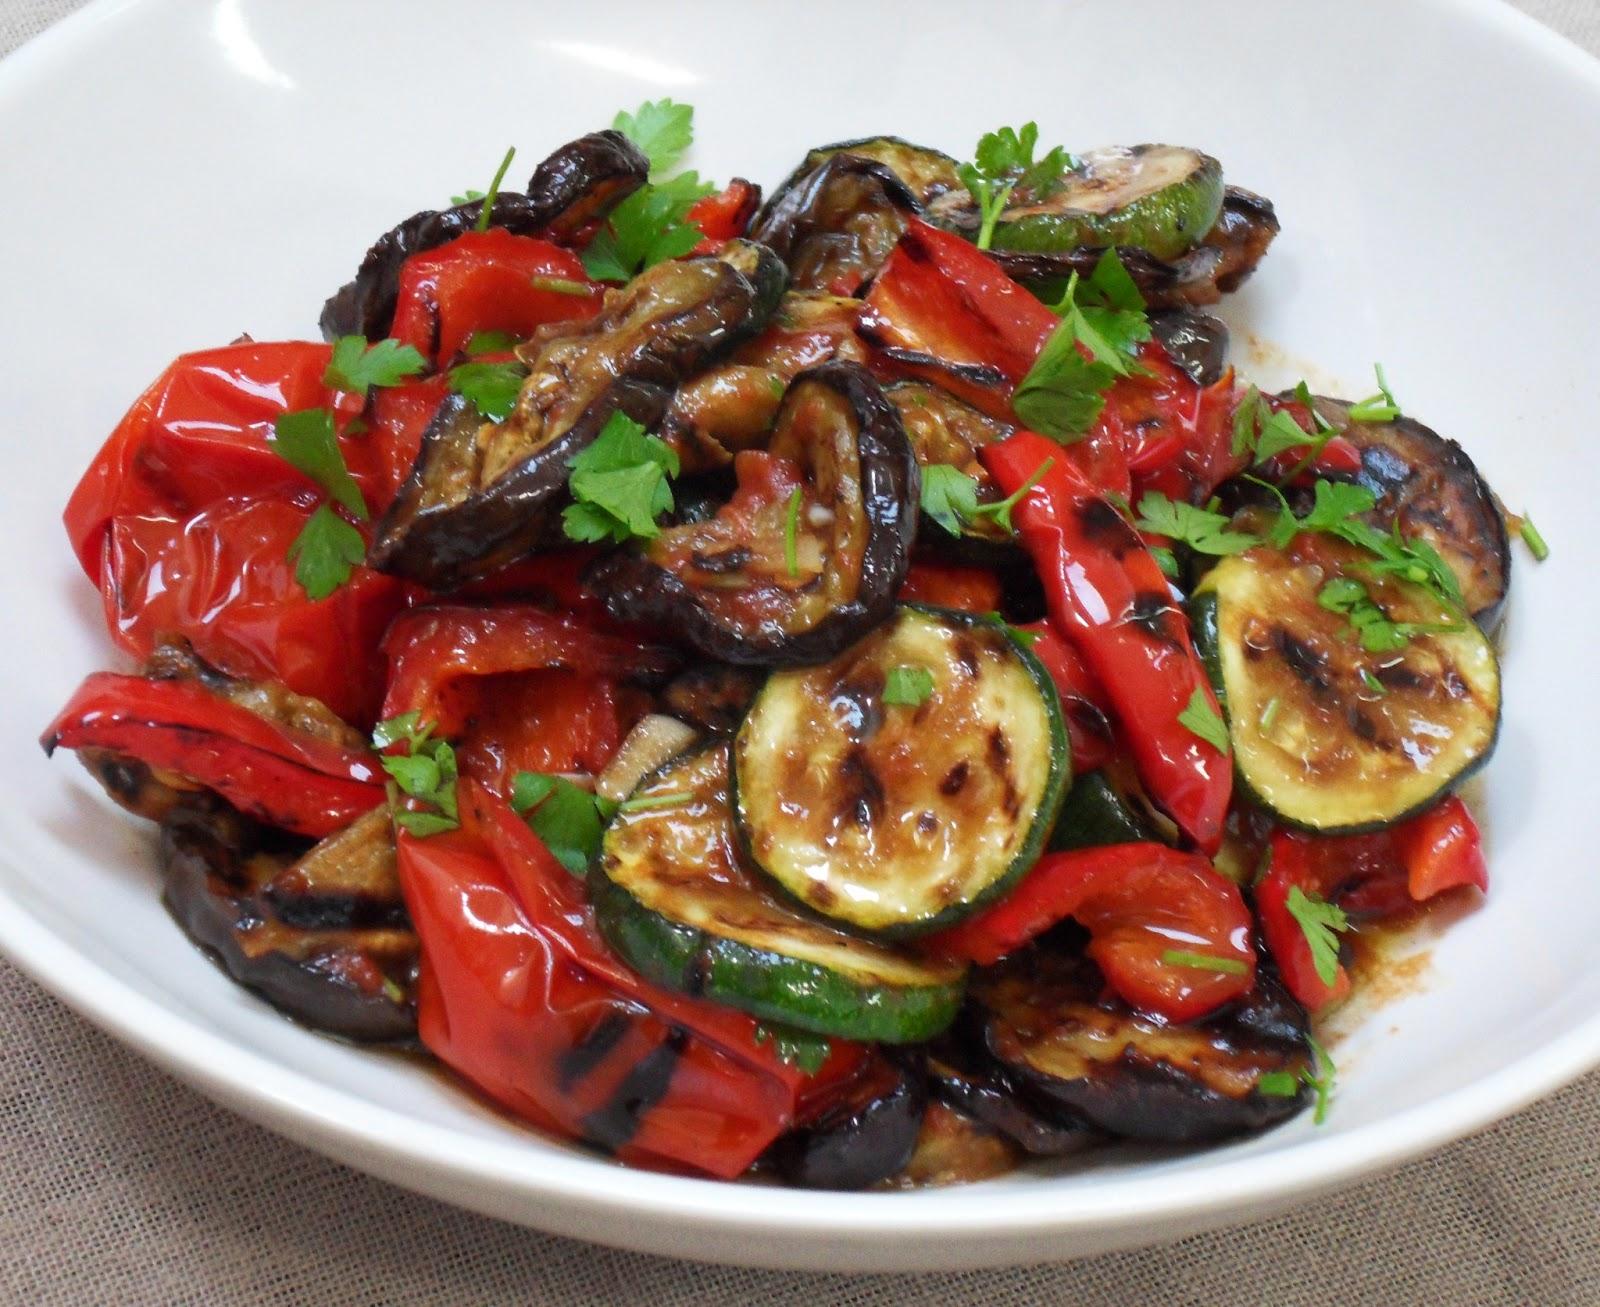 diana 39 s cook blog salade m diterran enne de courgettes aubergines et poivrons grill s. Black Bedroom Furniture Sets. Home Design Ideas